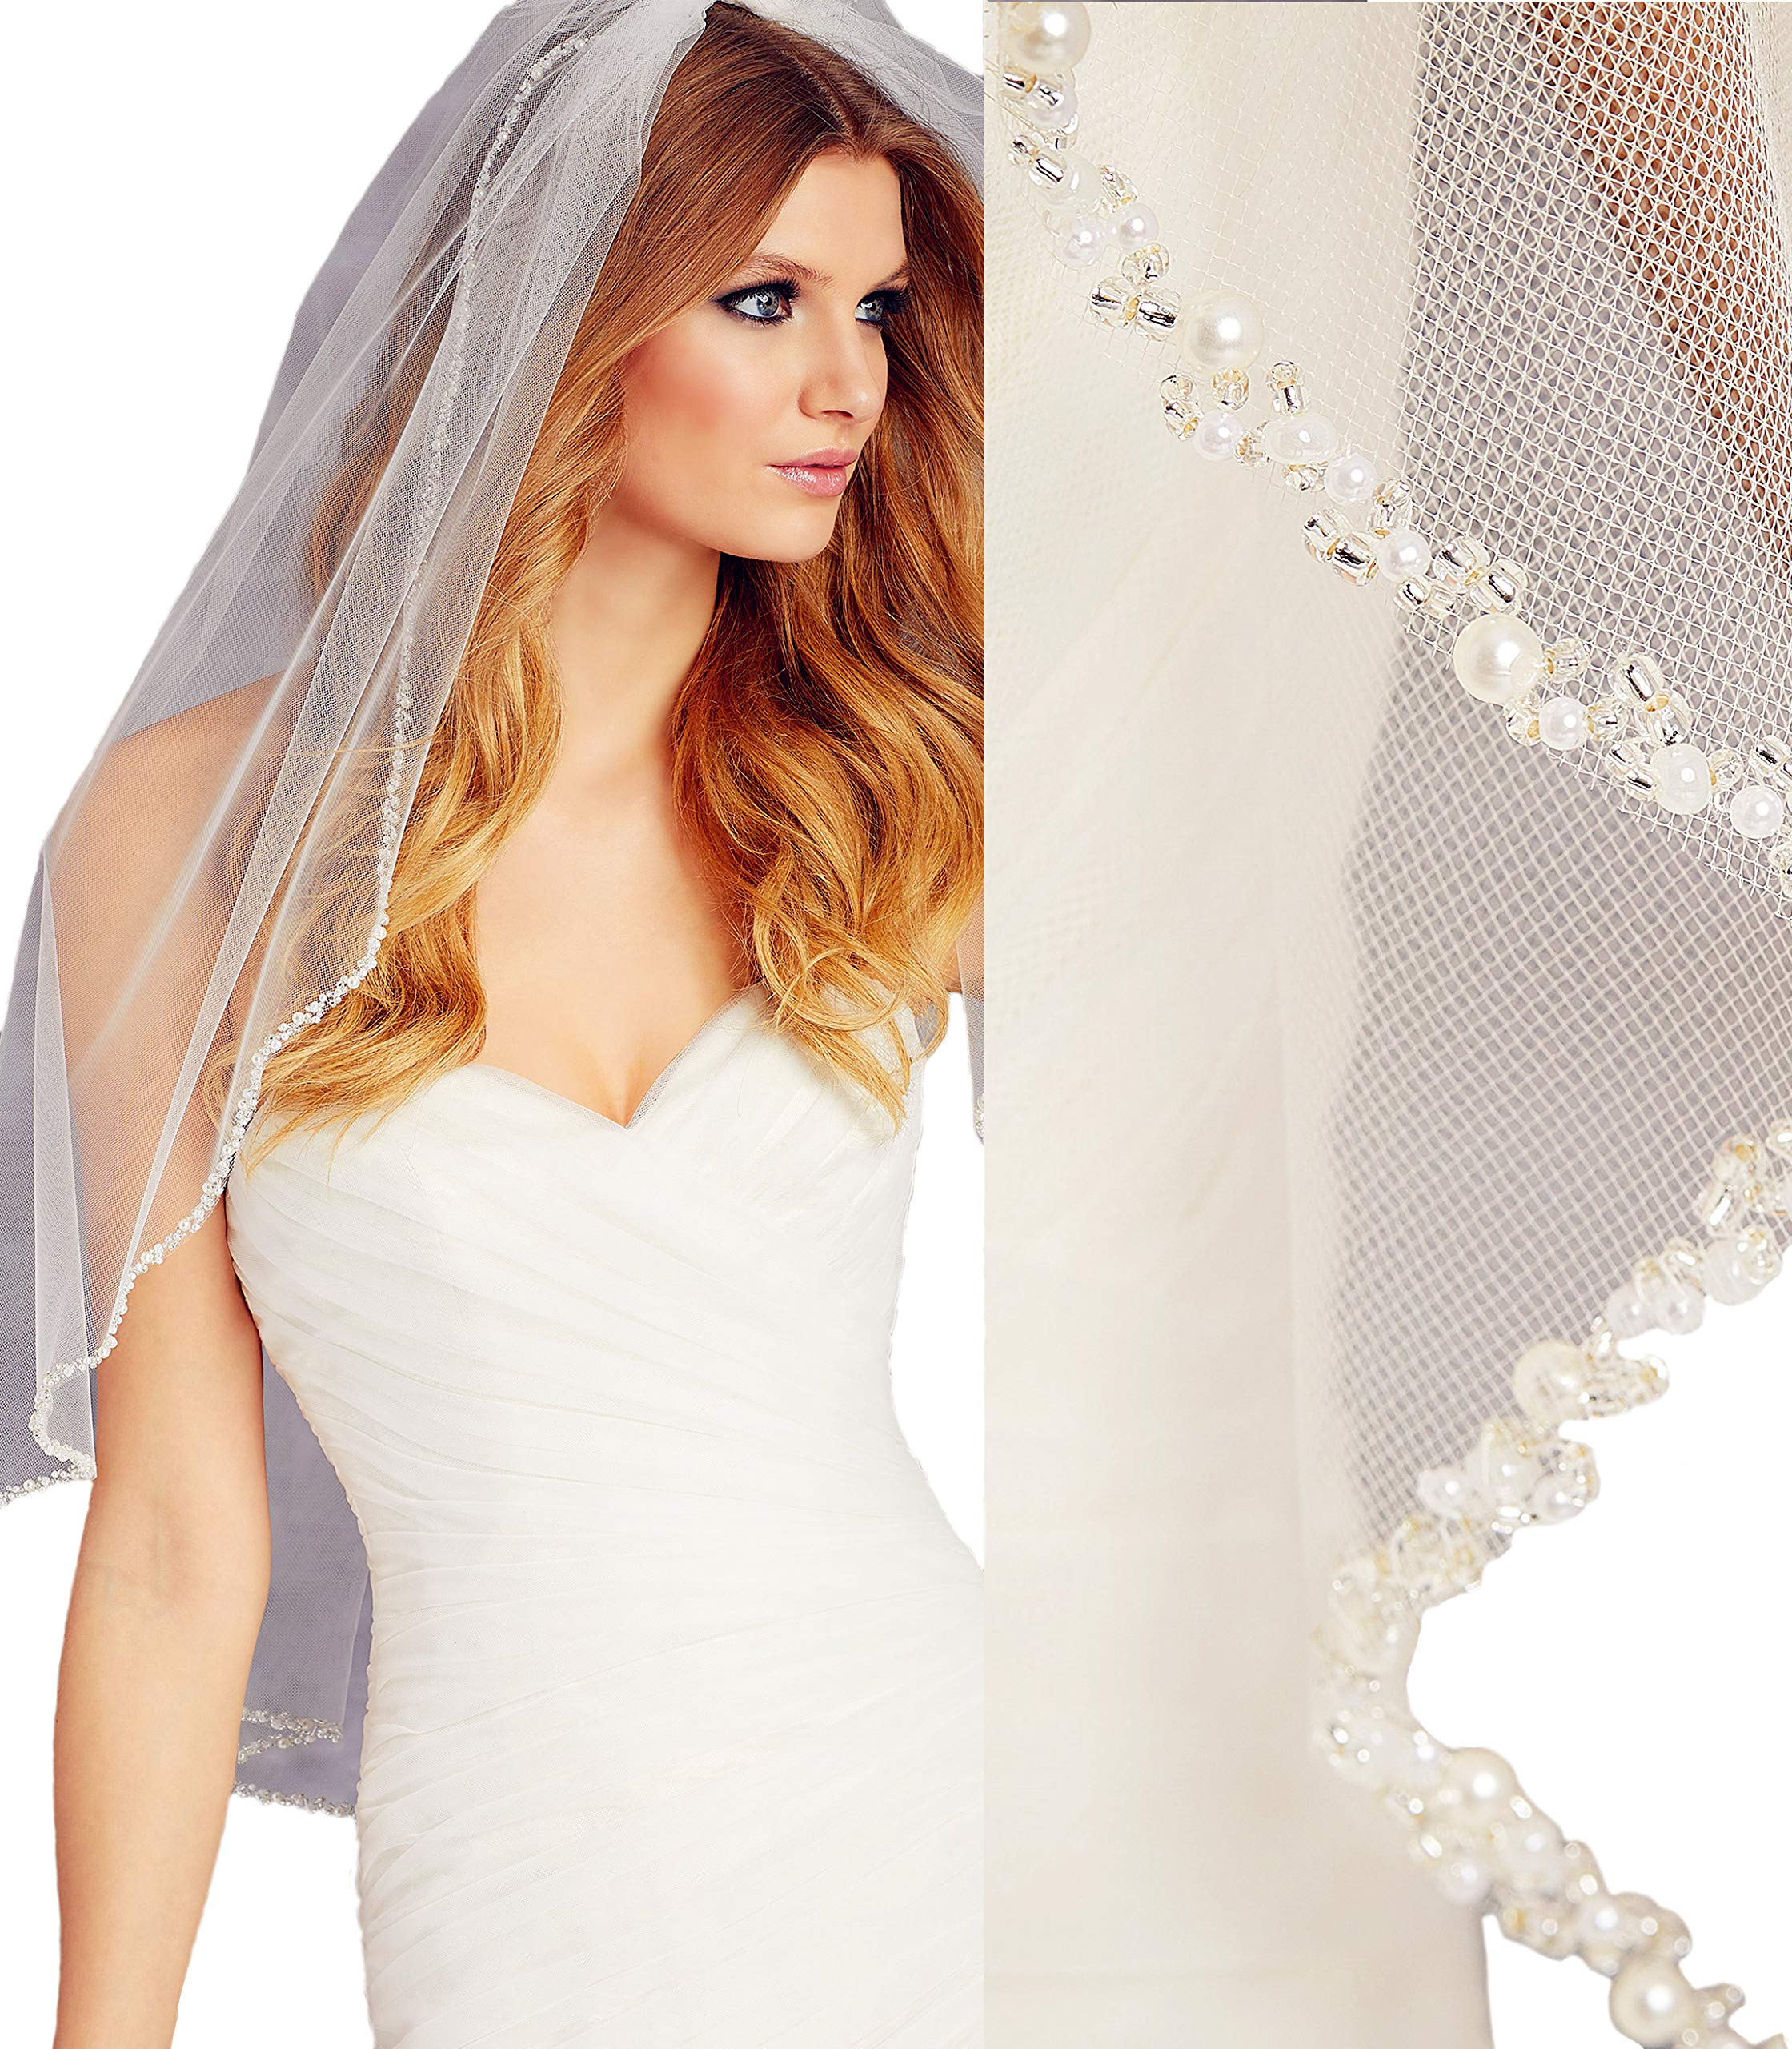 Passat Ivory 1T Ballet/Tea Wedding Veil Edged with Pearls and Beads bridal veil VL1003